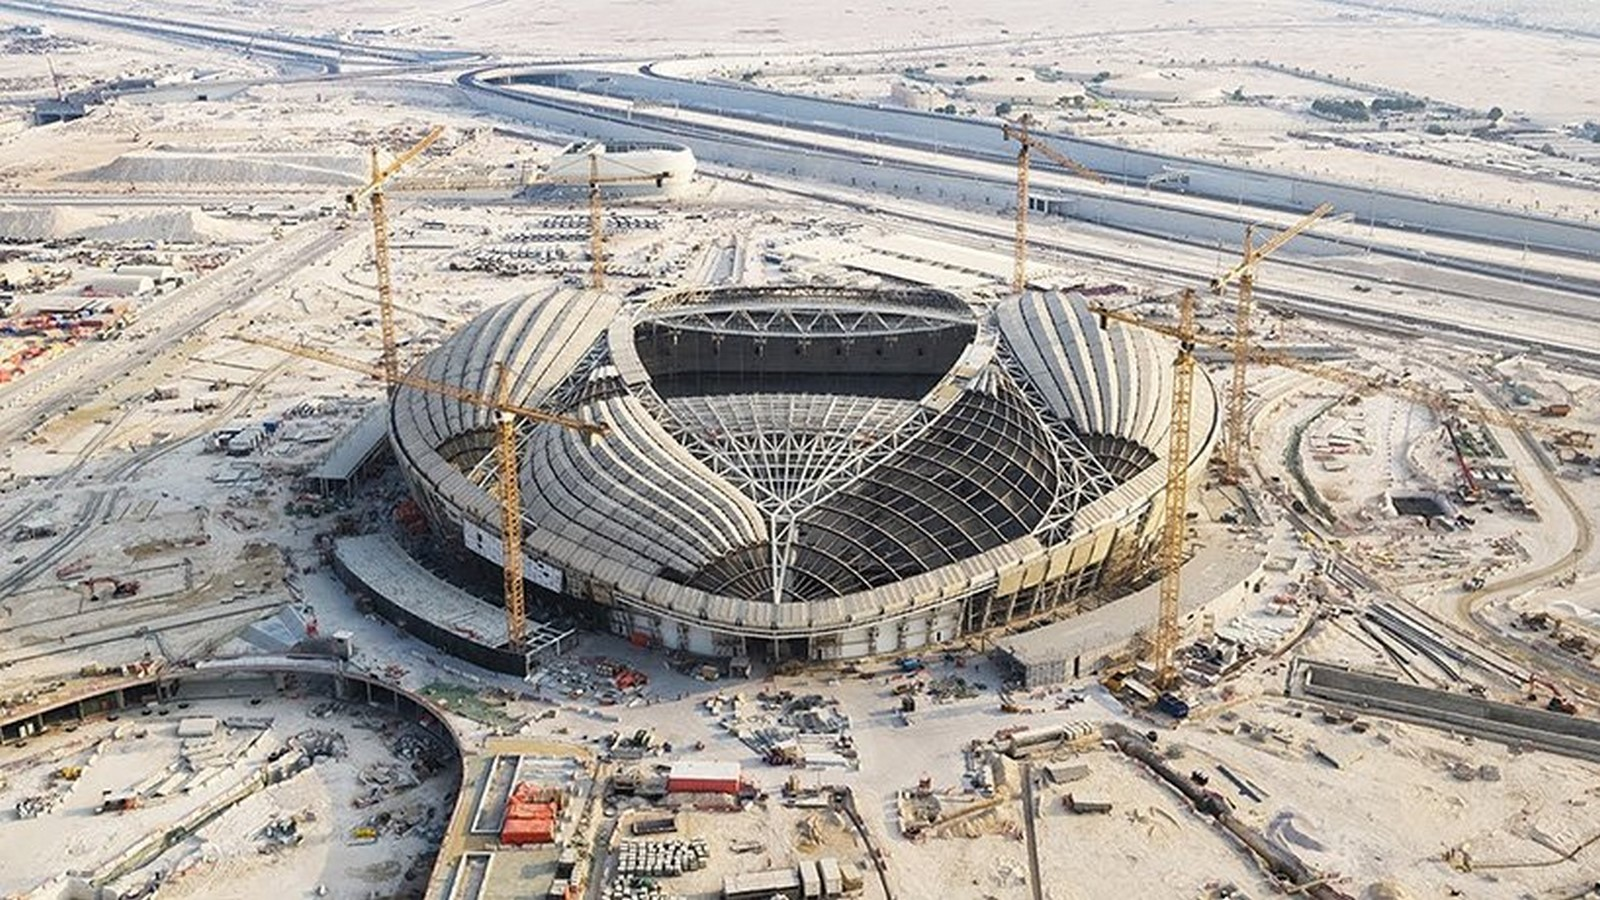 Al Wakrah Stadium Doha by Zaha Hadid Architects- Expensive and controversial - Sheet2